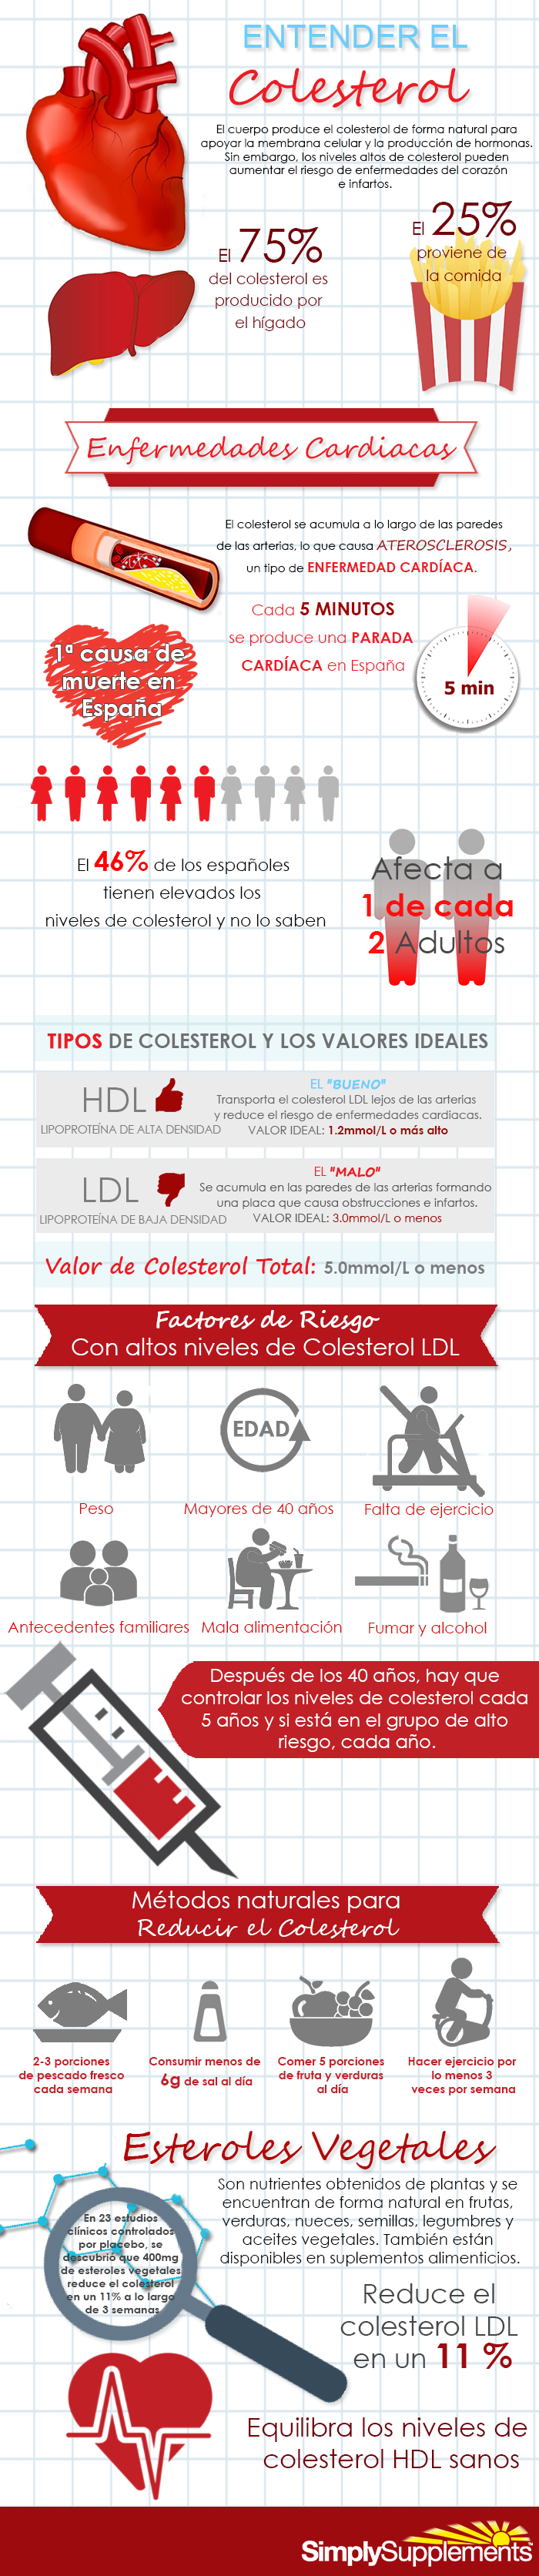 infografia-entender-el-colesterol